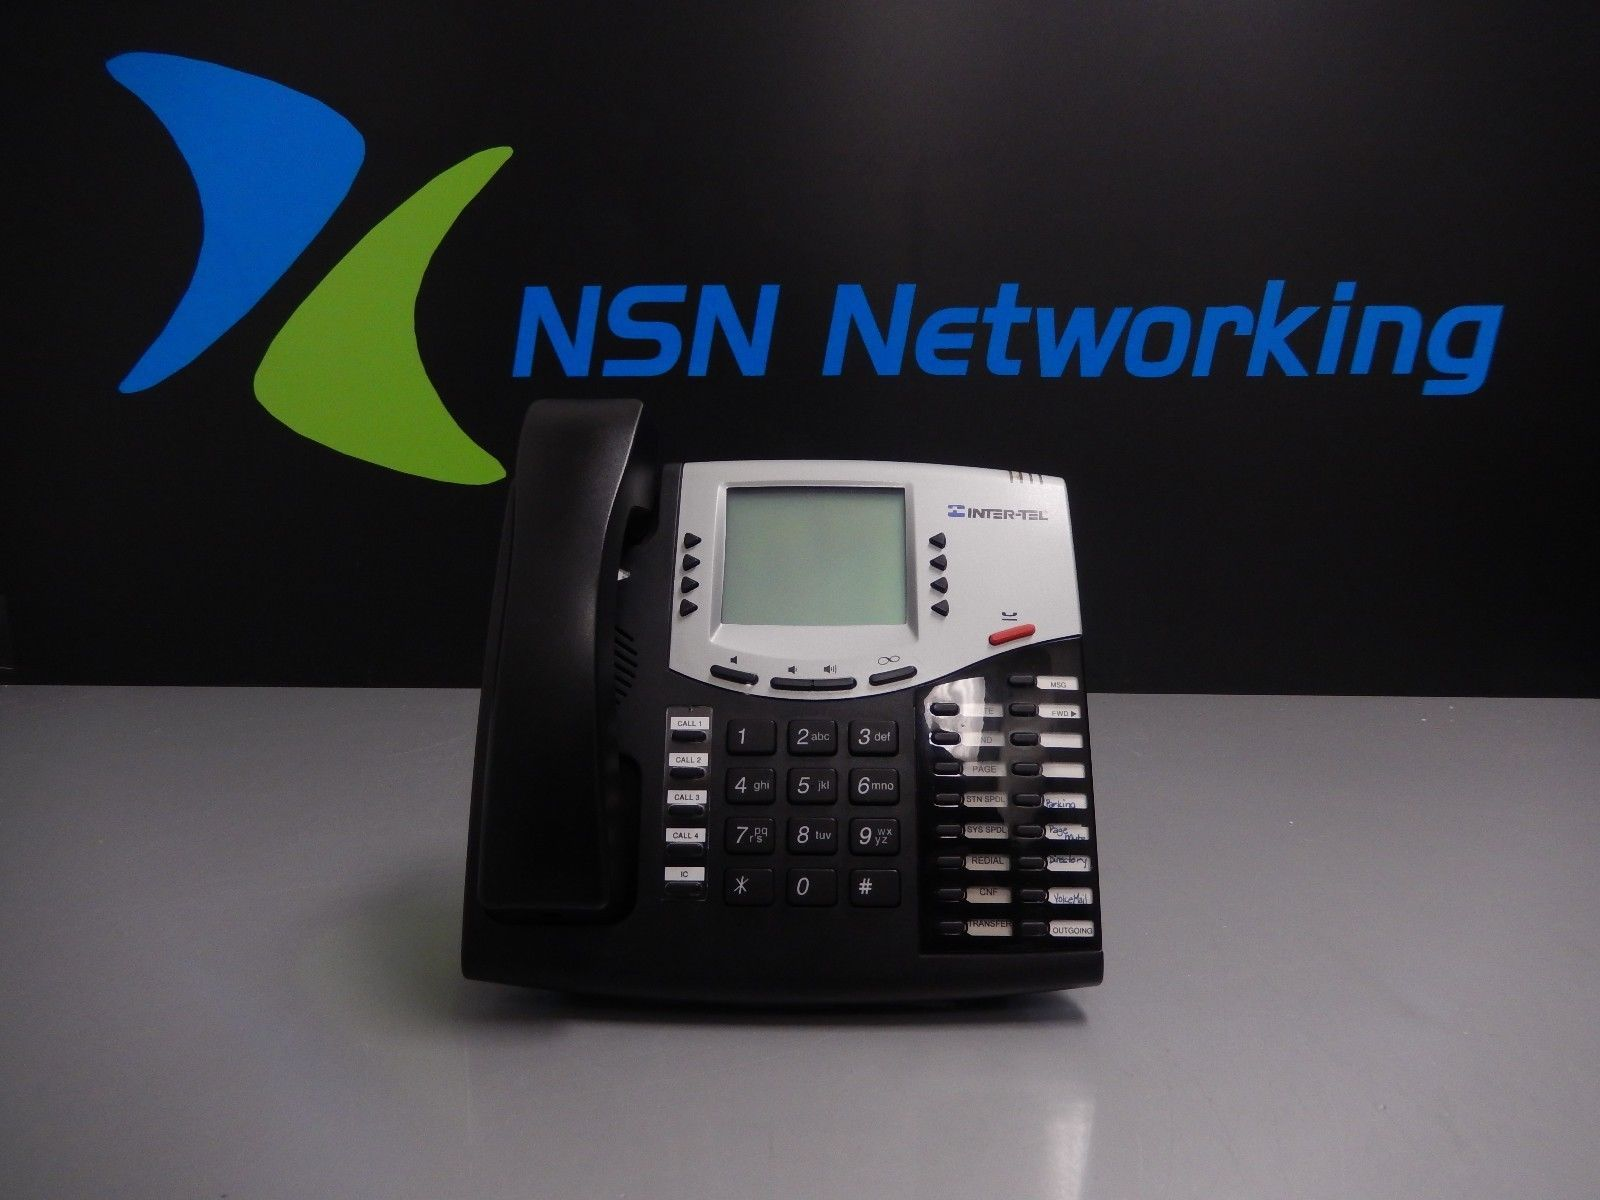 Inter-Tel Mitel 550.8662P Axxess Black Large LCD Display Phone FREE SHIPPING